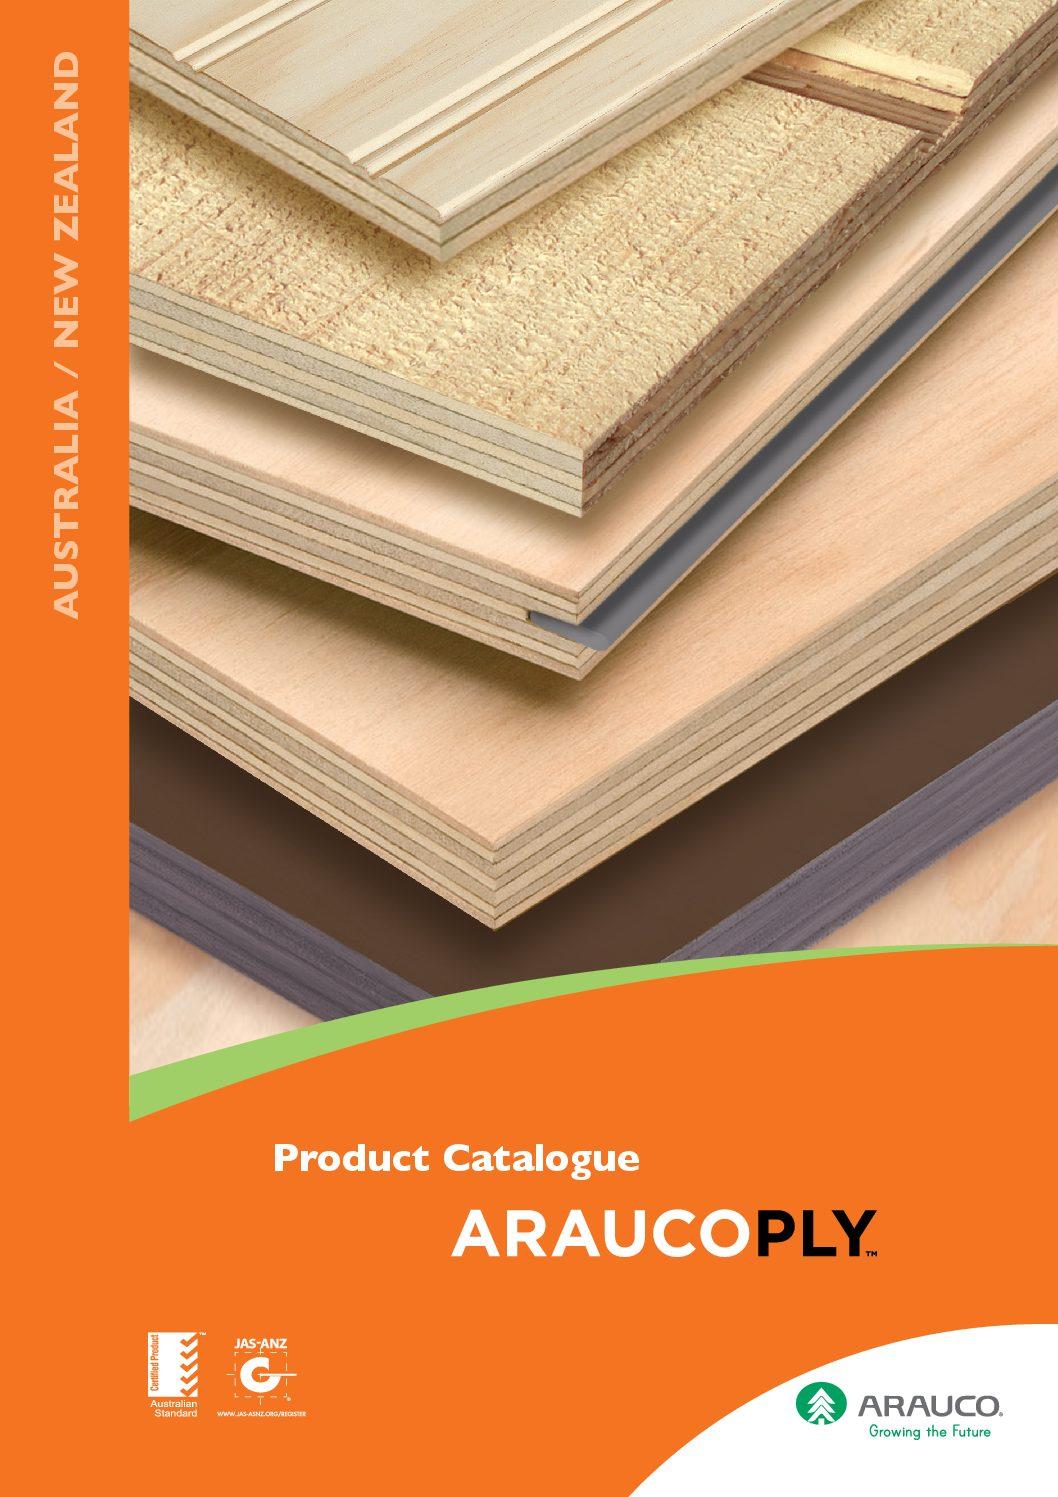 Araucoply Arauco